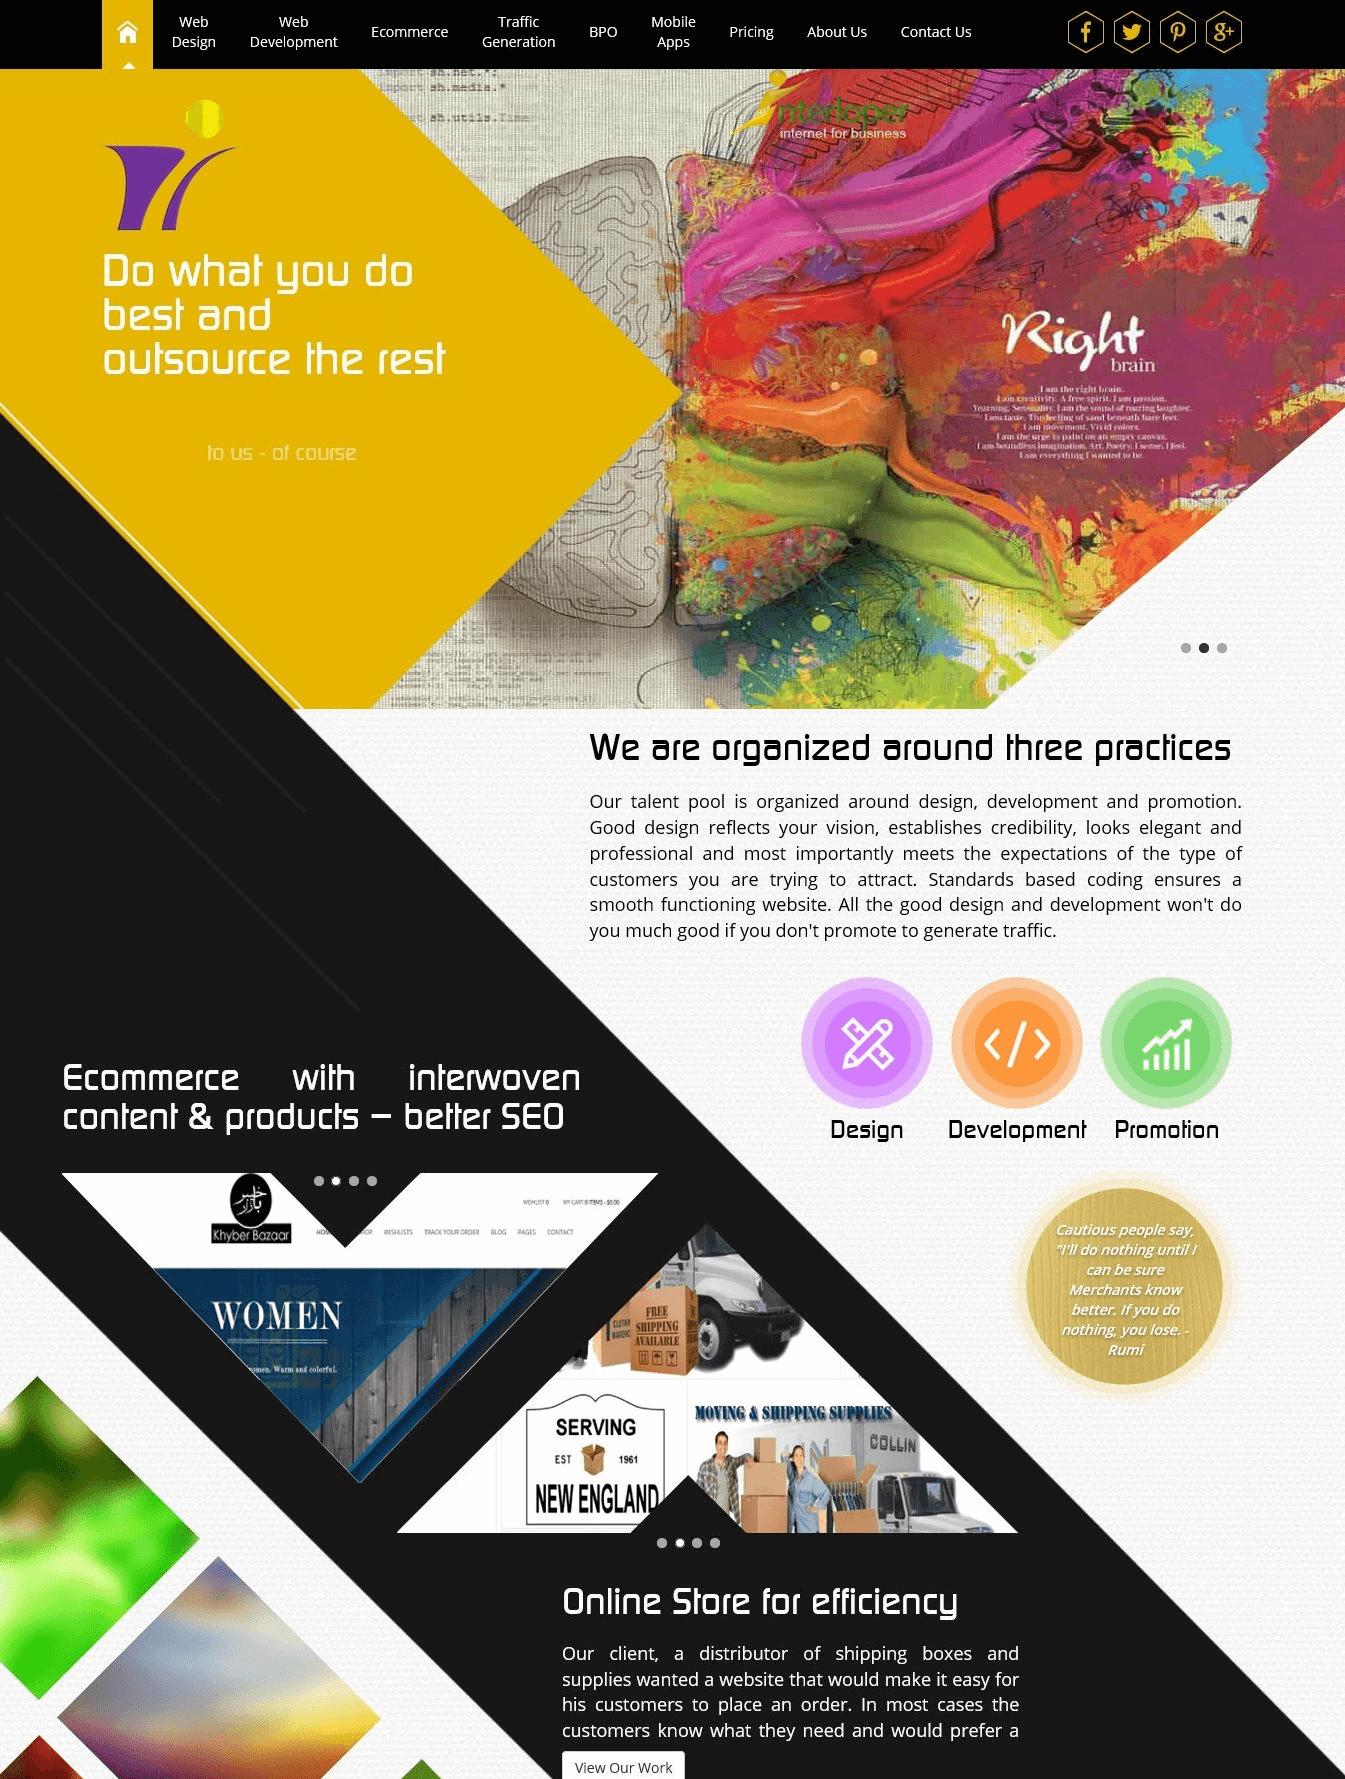 Example of a complex website design